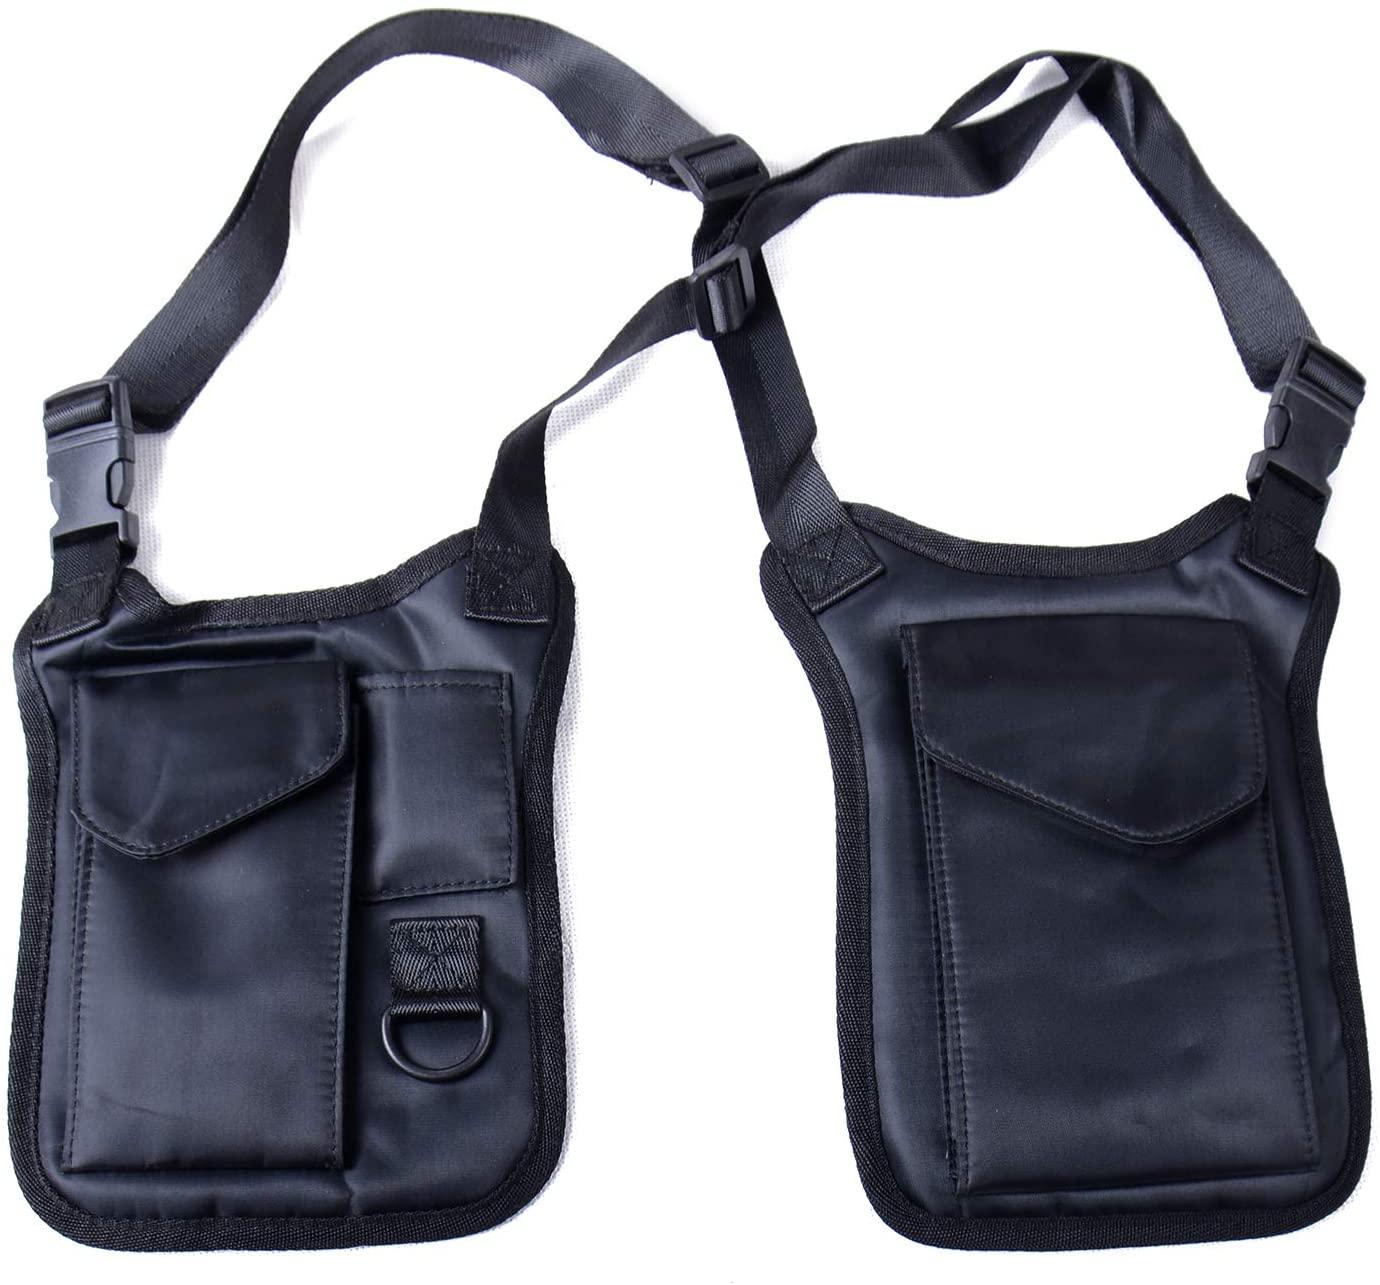 Anti-Theft Hidden Underarm Strap Wallet Holster Bag Leisure Nylon Double Shoulder Pocket Sport Vest Outdoors (Black)